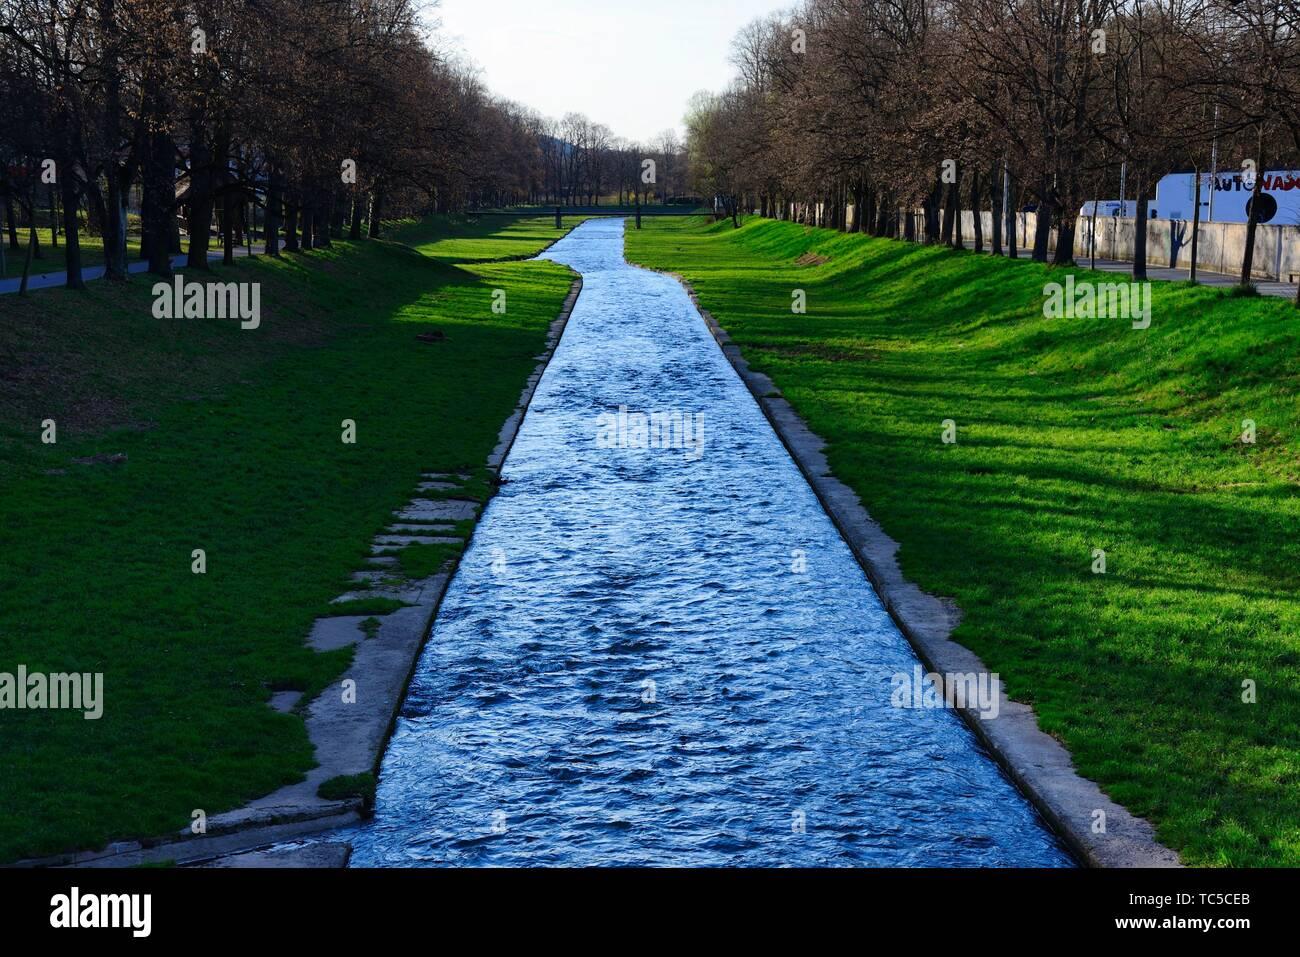 Roter Main - Red Main river, city center of Bayreuth, Upper Franconia, Bavaria, Bayern, Germany, Europe - Stock Image